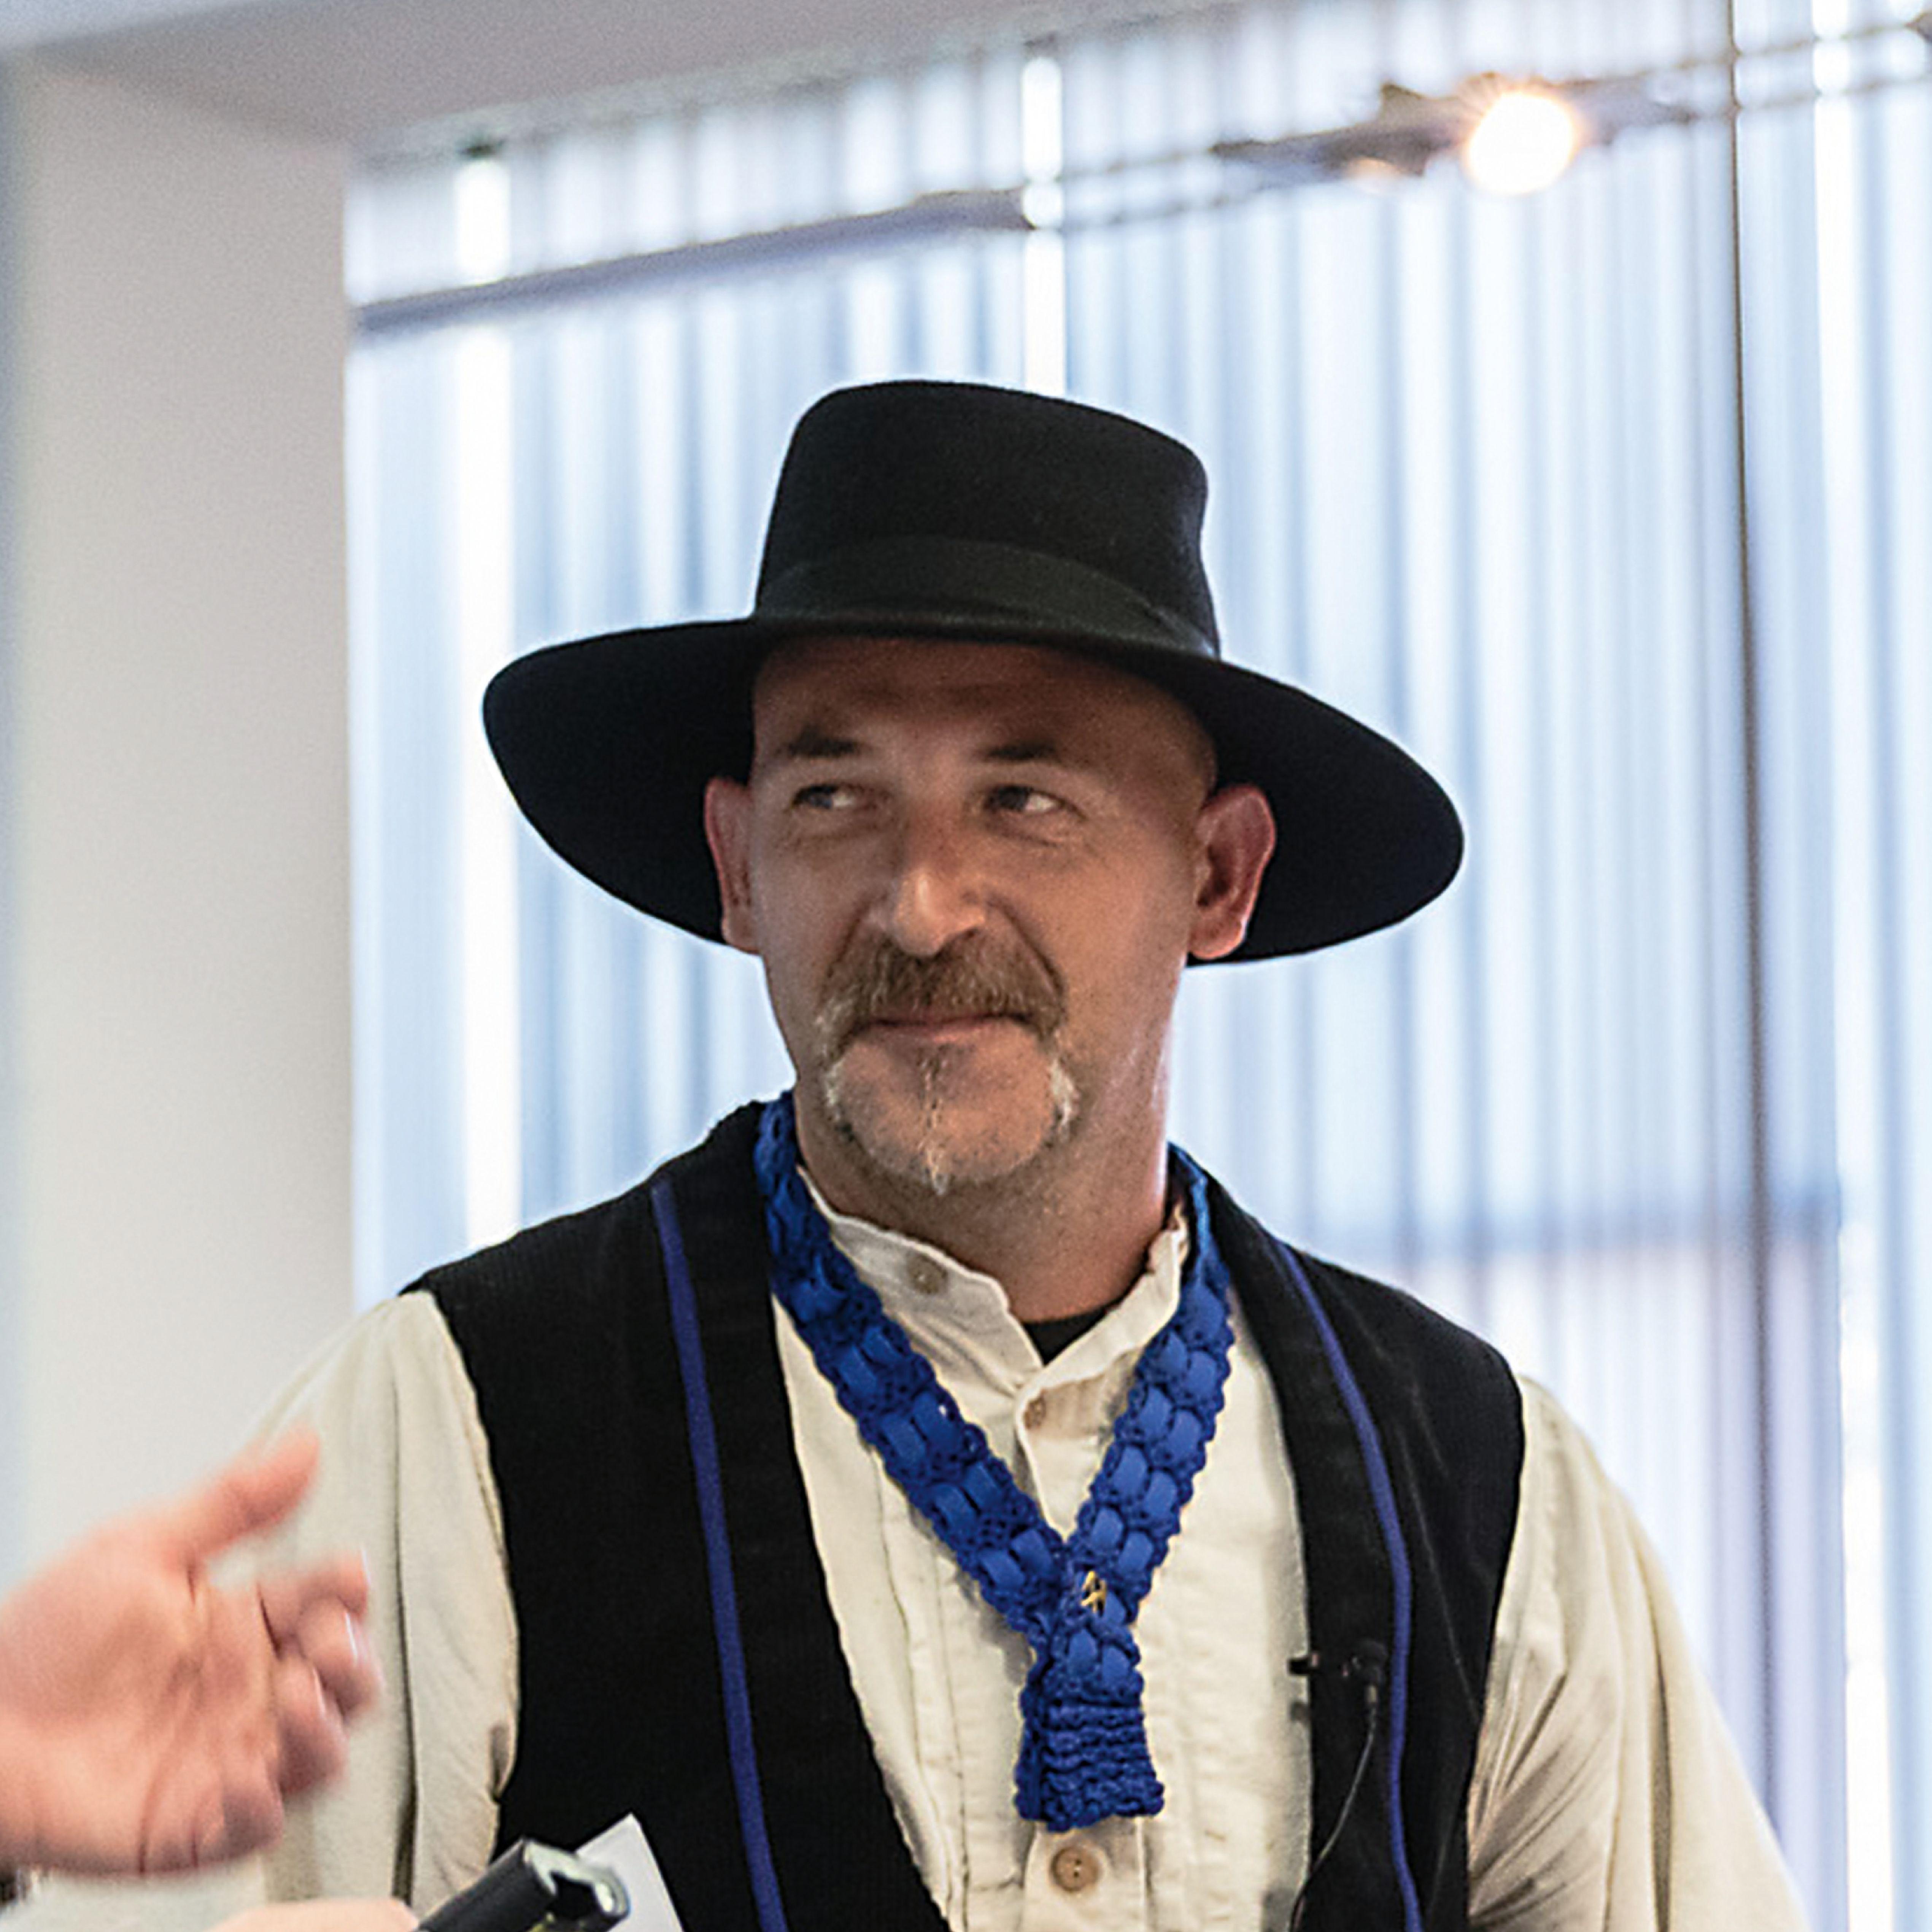 Christian Gartke Dachdeckermeister Testimonial